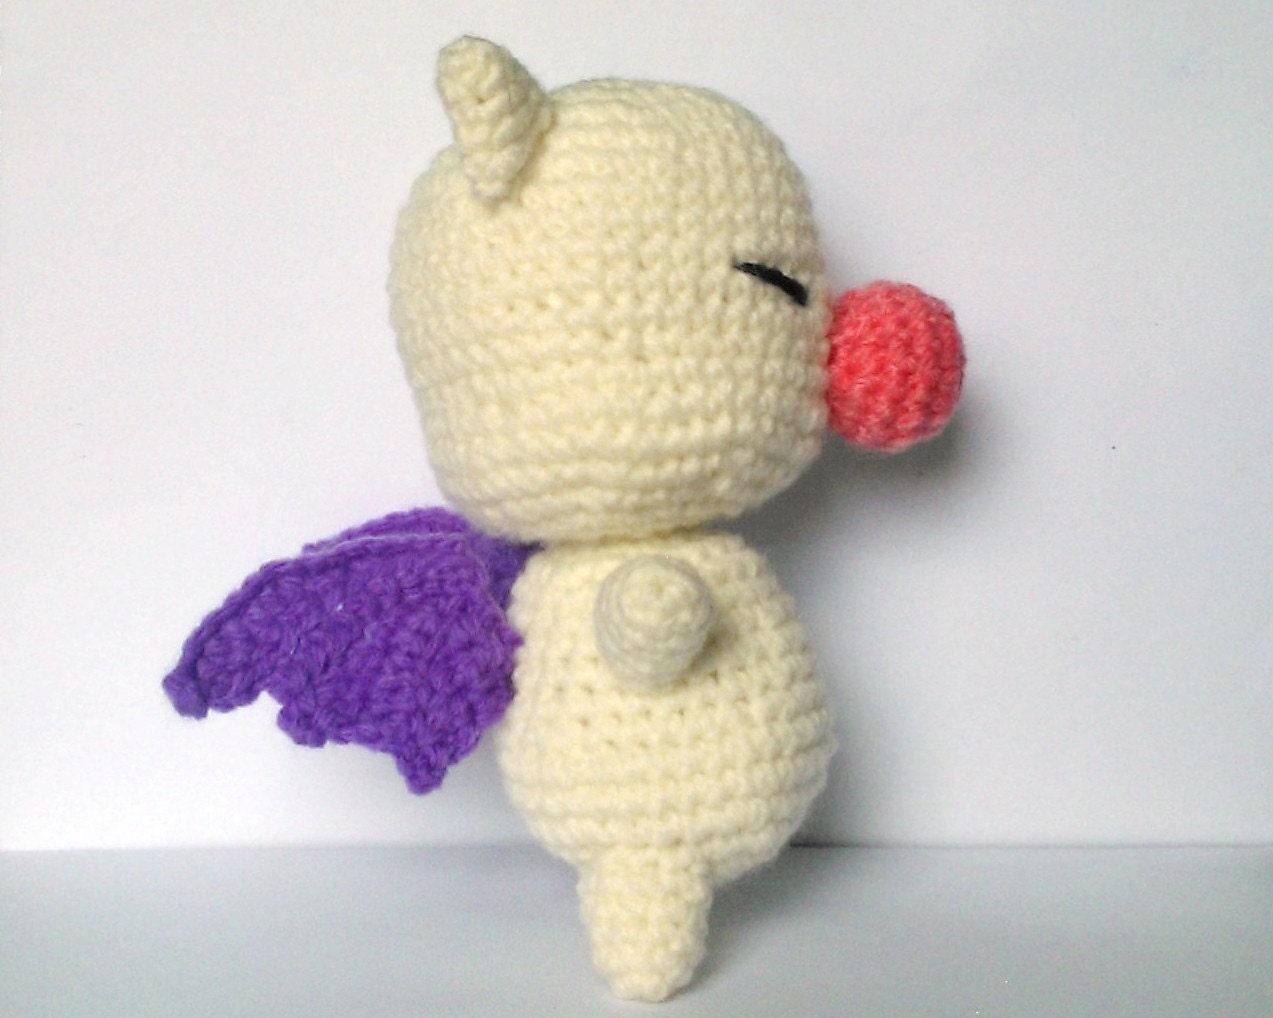 Flying Angel Pig Amigurumi Crochet Pattern : Moogle the Flying Pig Amigurumi Crochet Pattern PDF